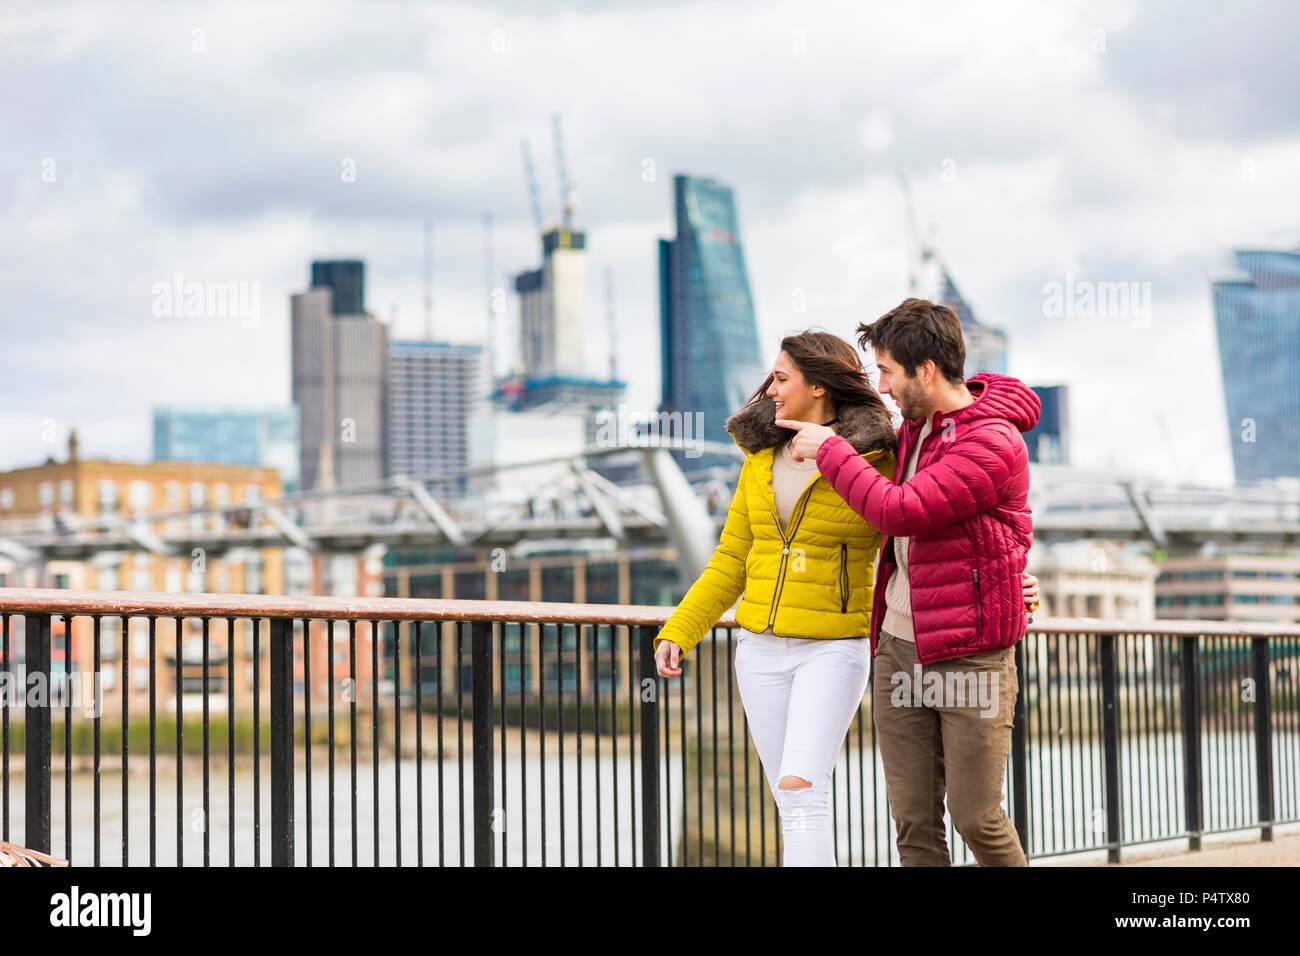 UK, London, young couple walking on bridge watching something Stock Photo